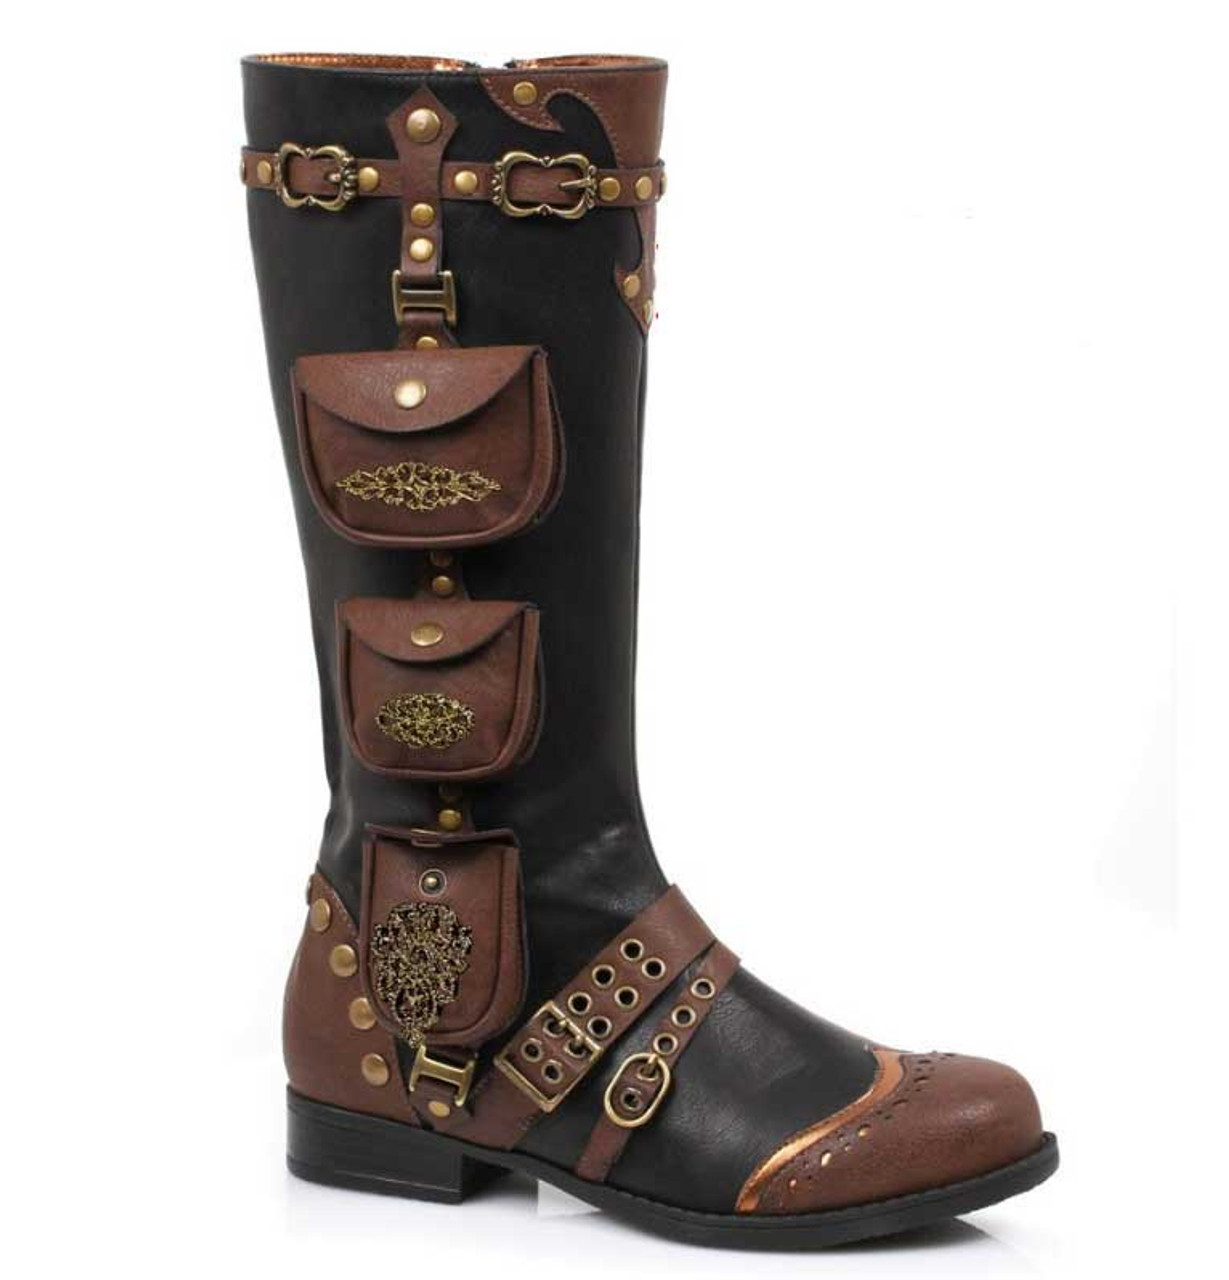 6993e0efa6da3 Ellie Shoes   181-SILAS, Women's Steampunk Boot